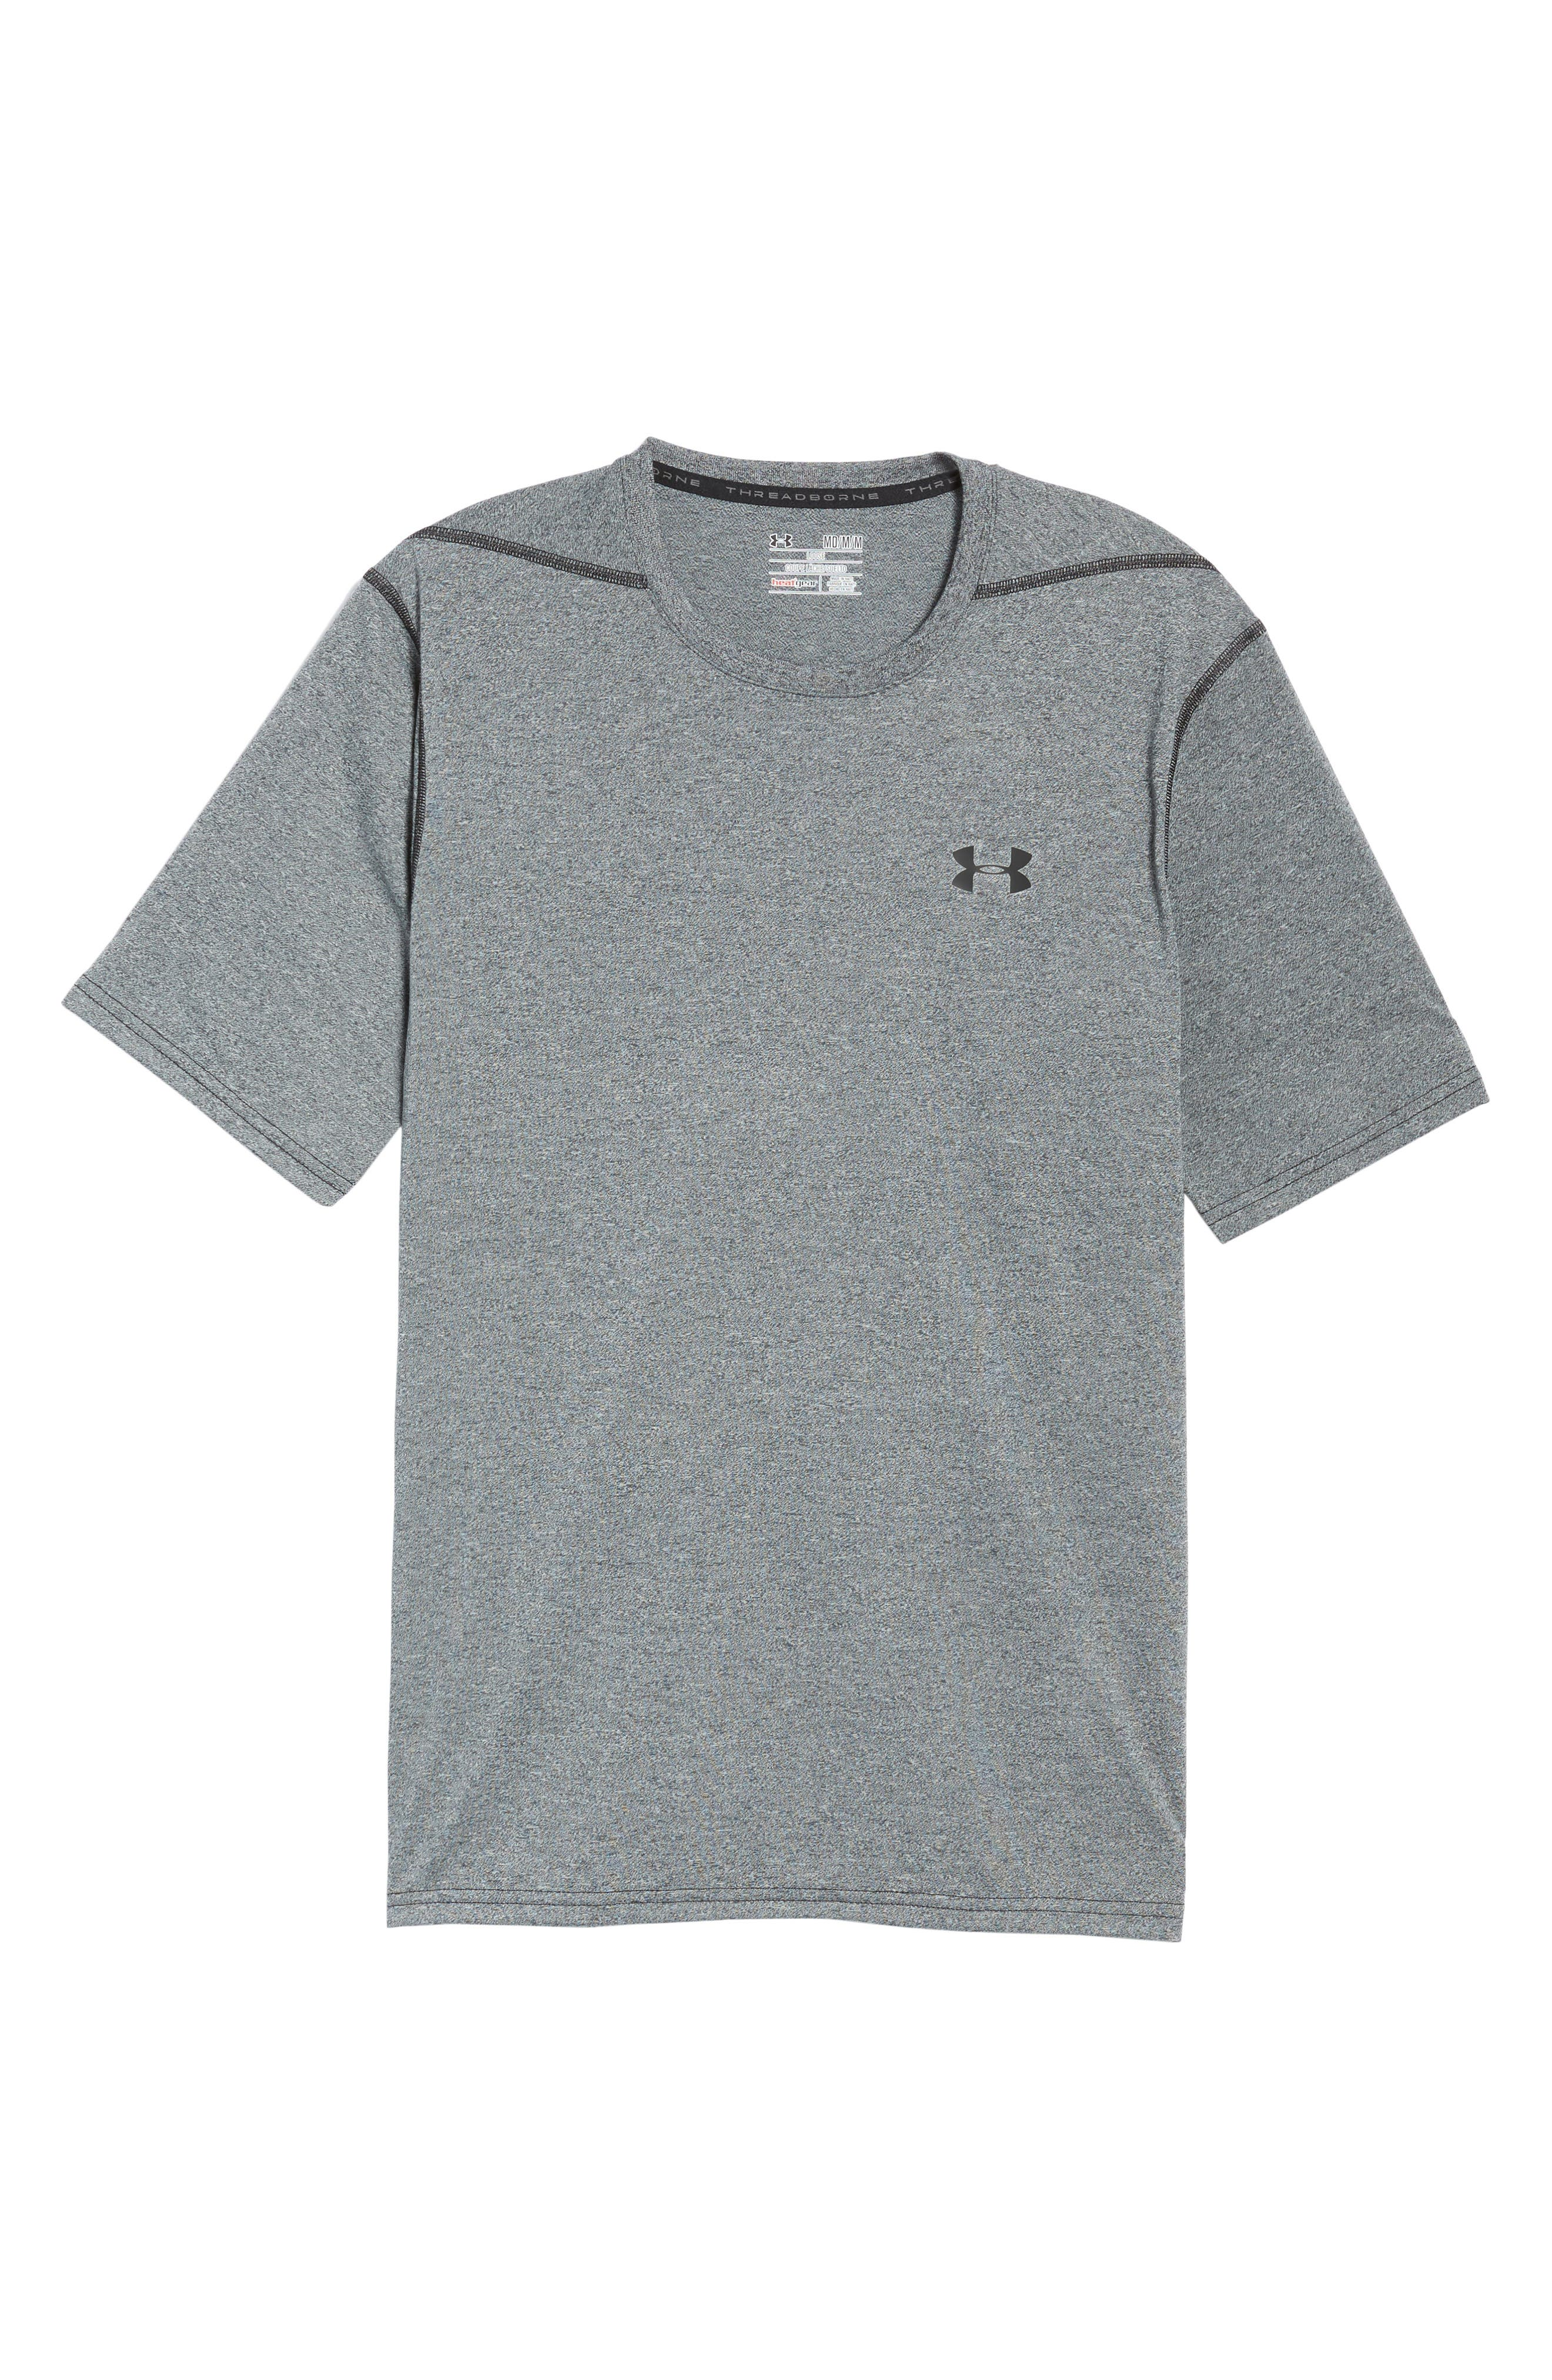 Regular Fit Threadborne T-Shirt,                             Alternate thumbnail 6, color,                             BLACK TWIST